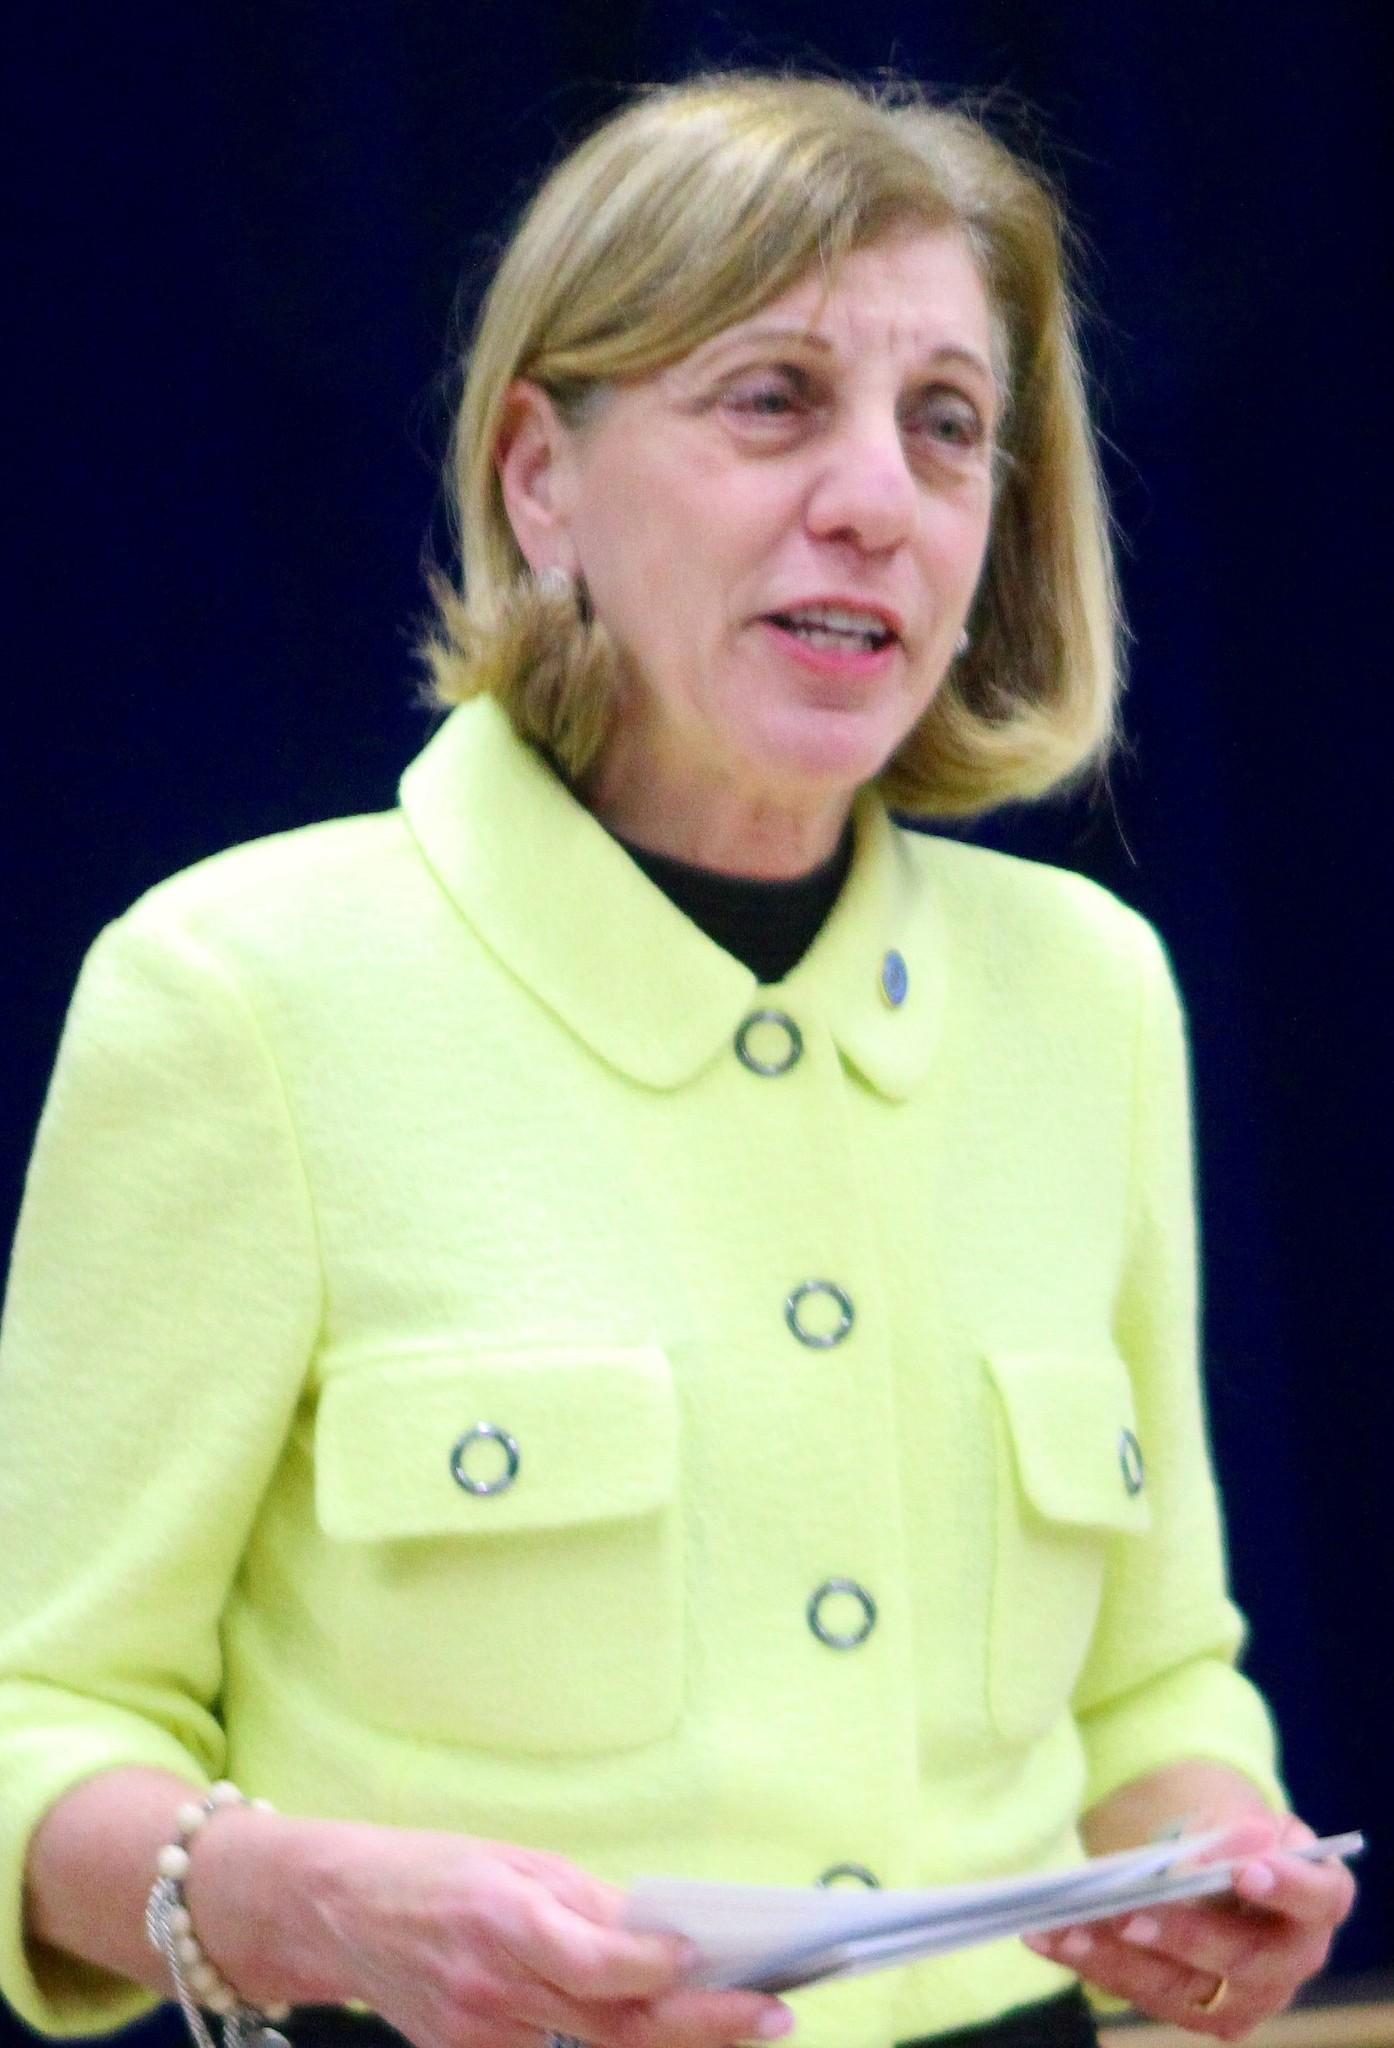 Barbara Bry addresses the Feb. 5 Bird Rock Community Council meeting at Bird Rock Elementary School.